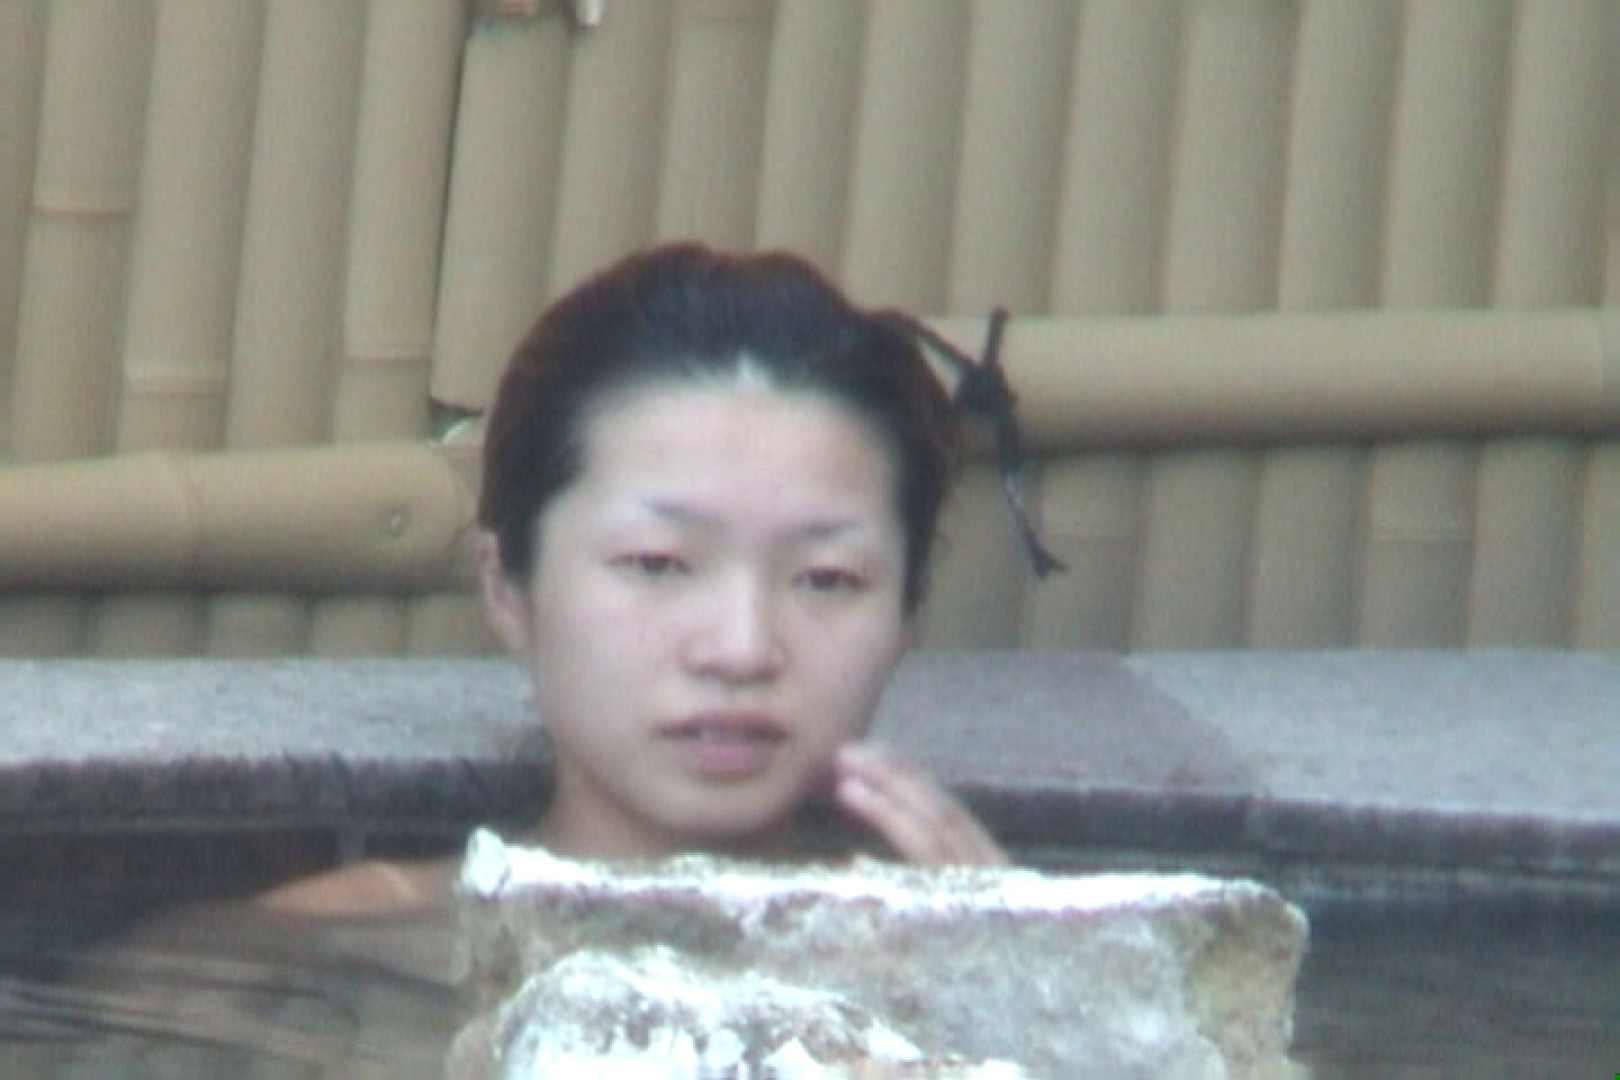 Aquaな露天風呂Vol.571 美しいOLの裸体 | 露天風呂突入  99pic 34